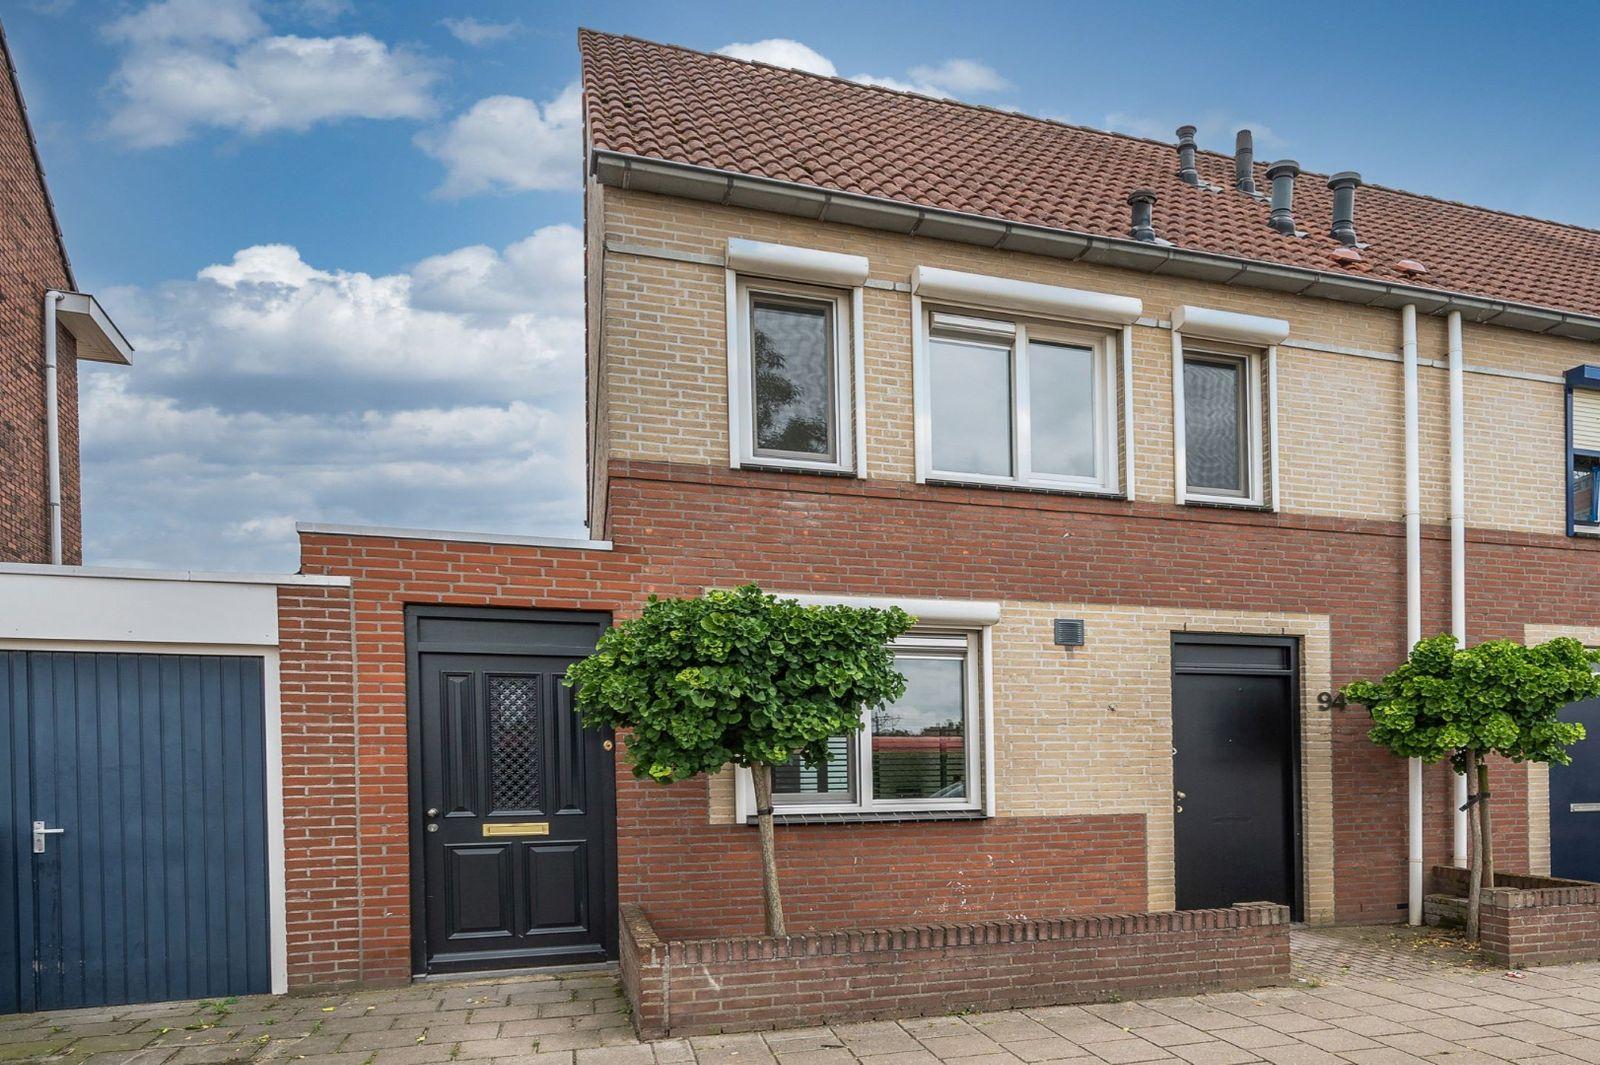 Sloterbeekstraat 94, Venlo